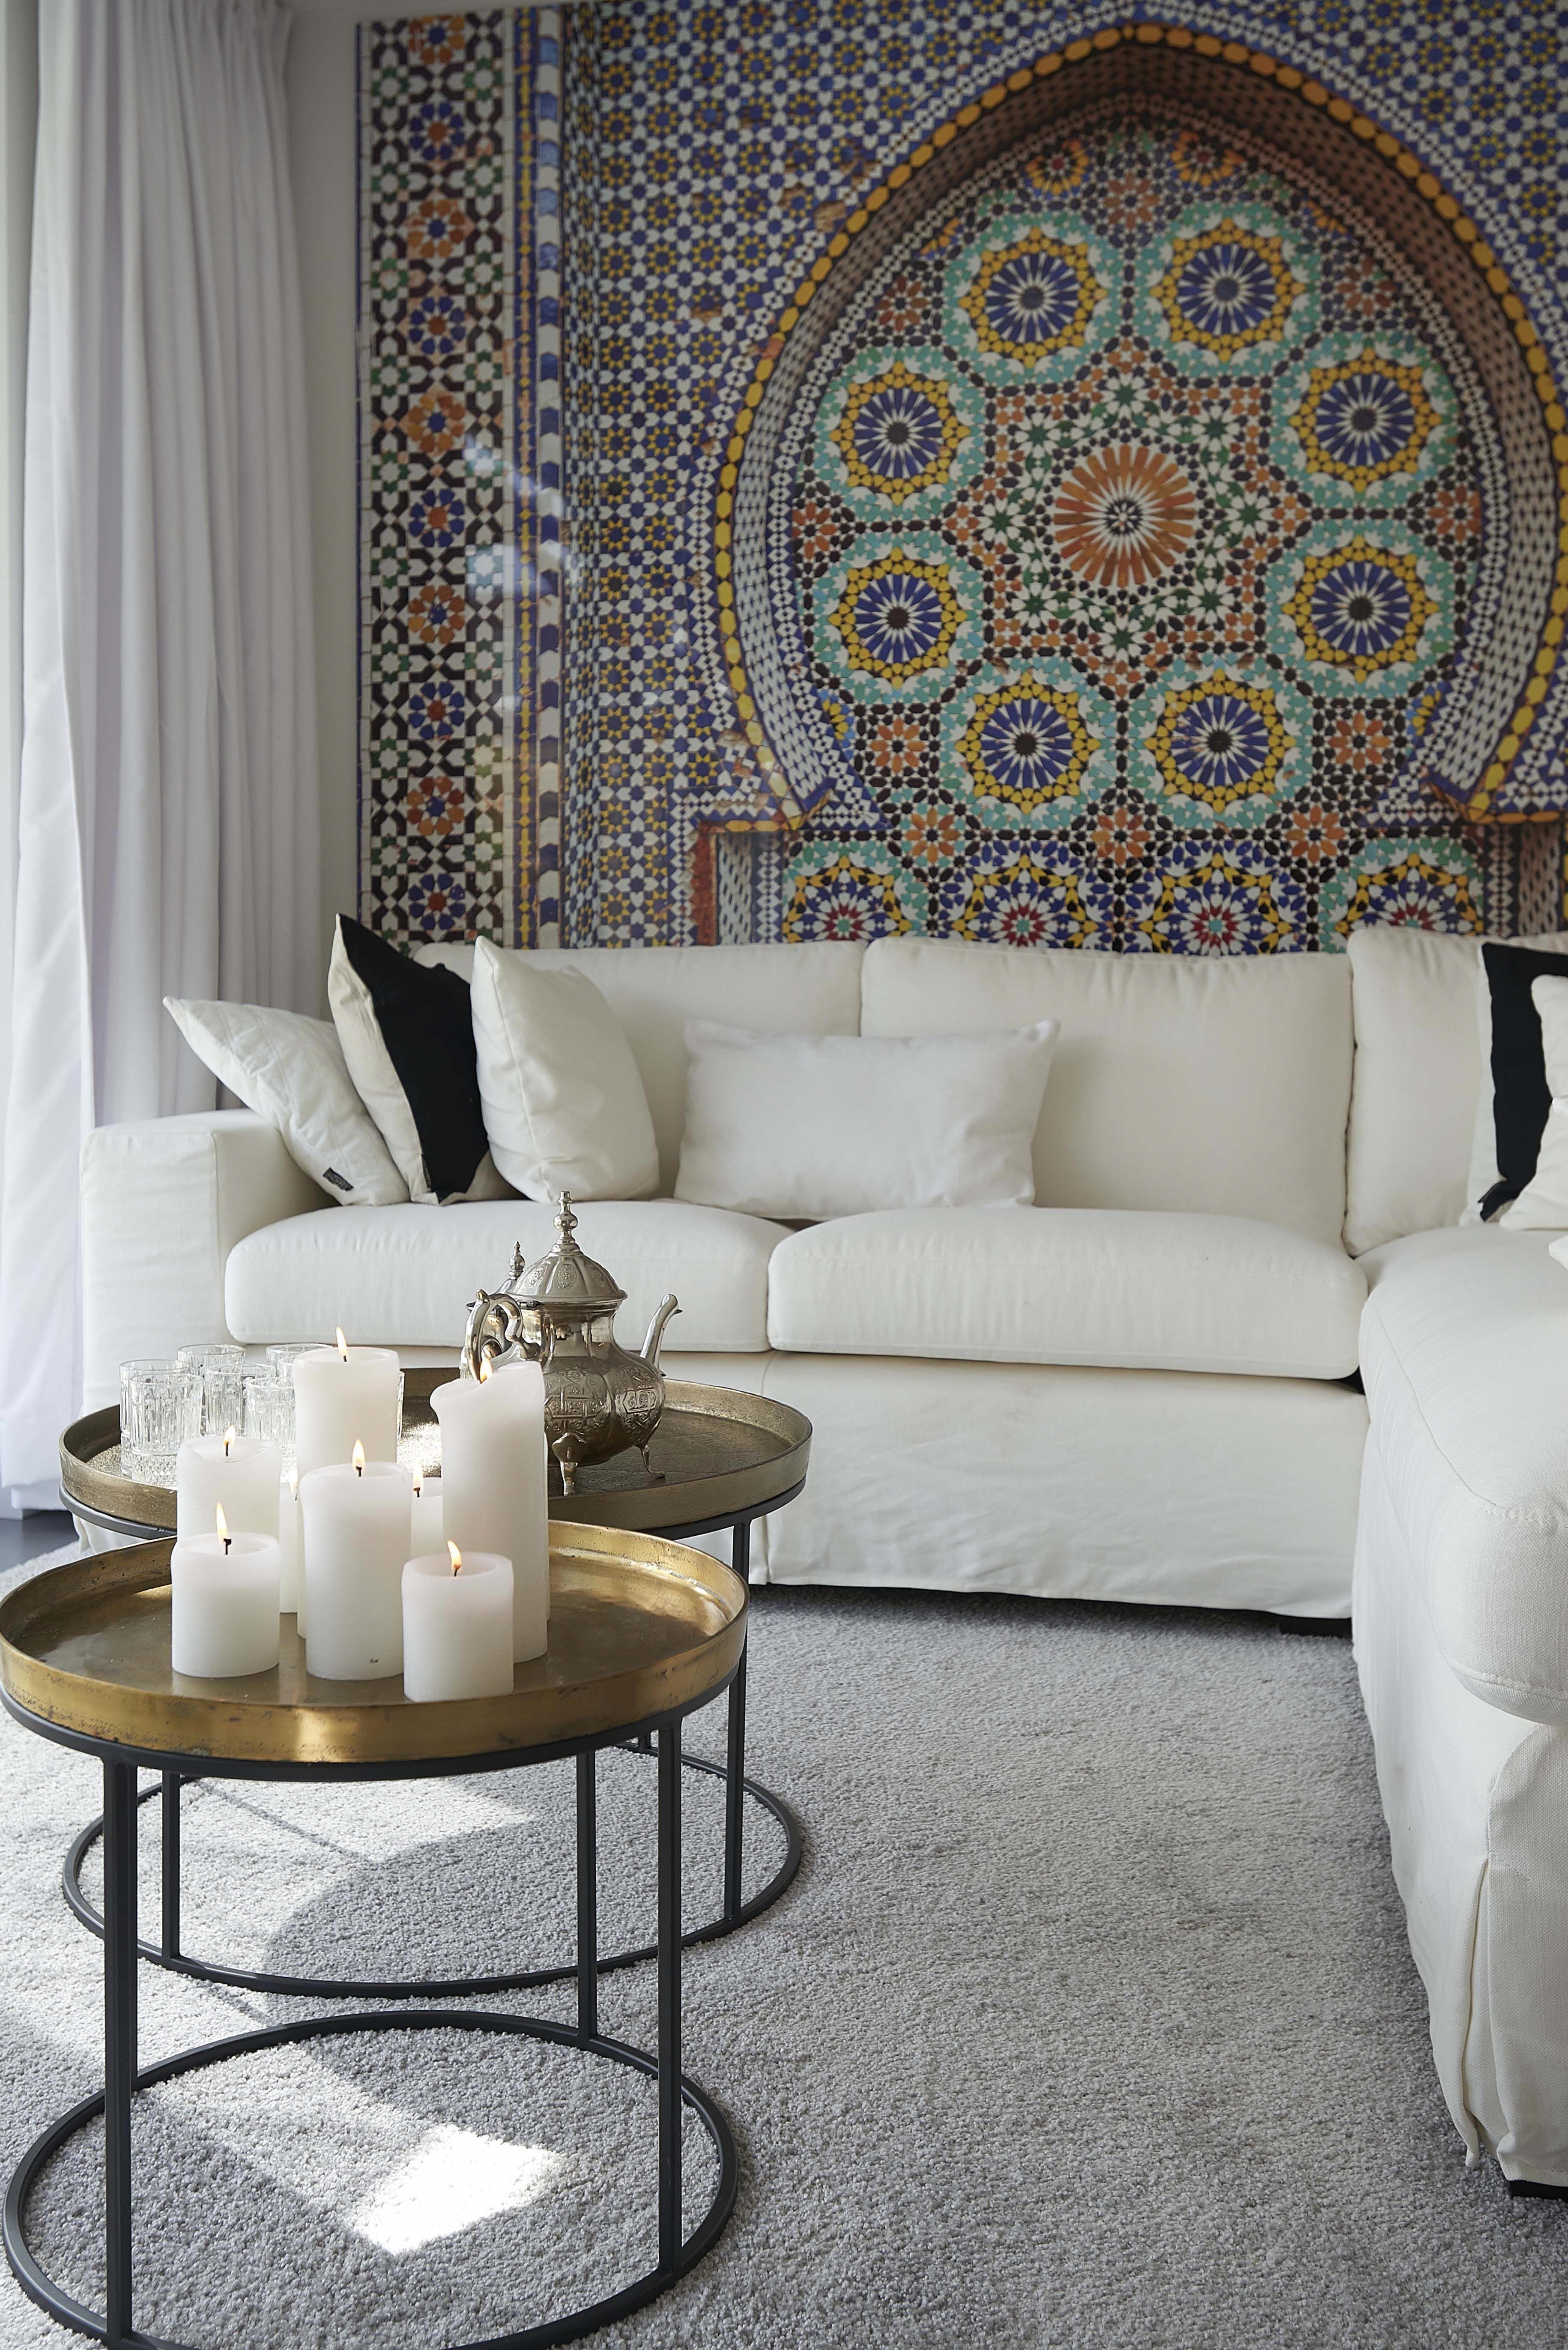 A Big No No To Classic White Furniture That Wall Though